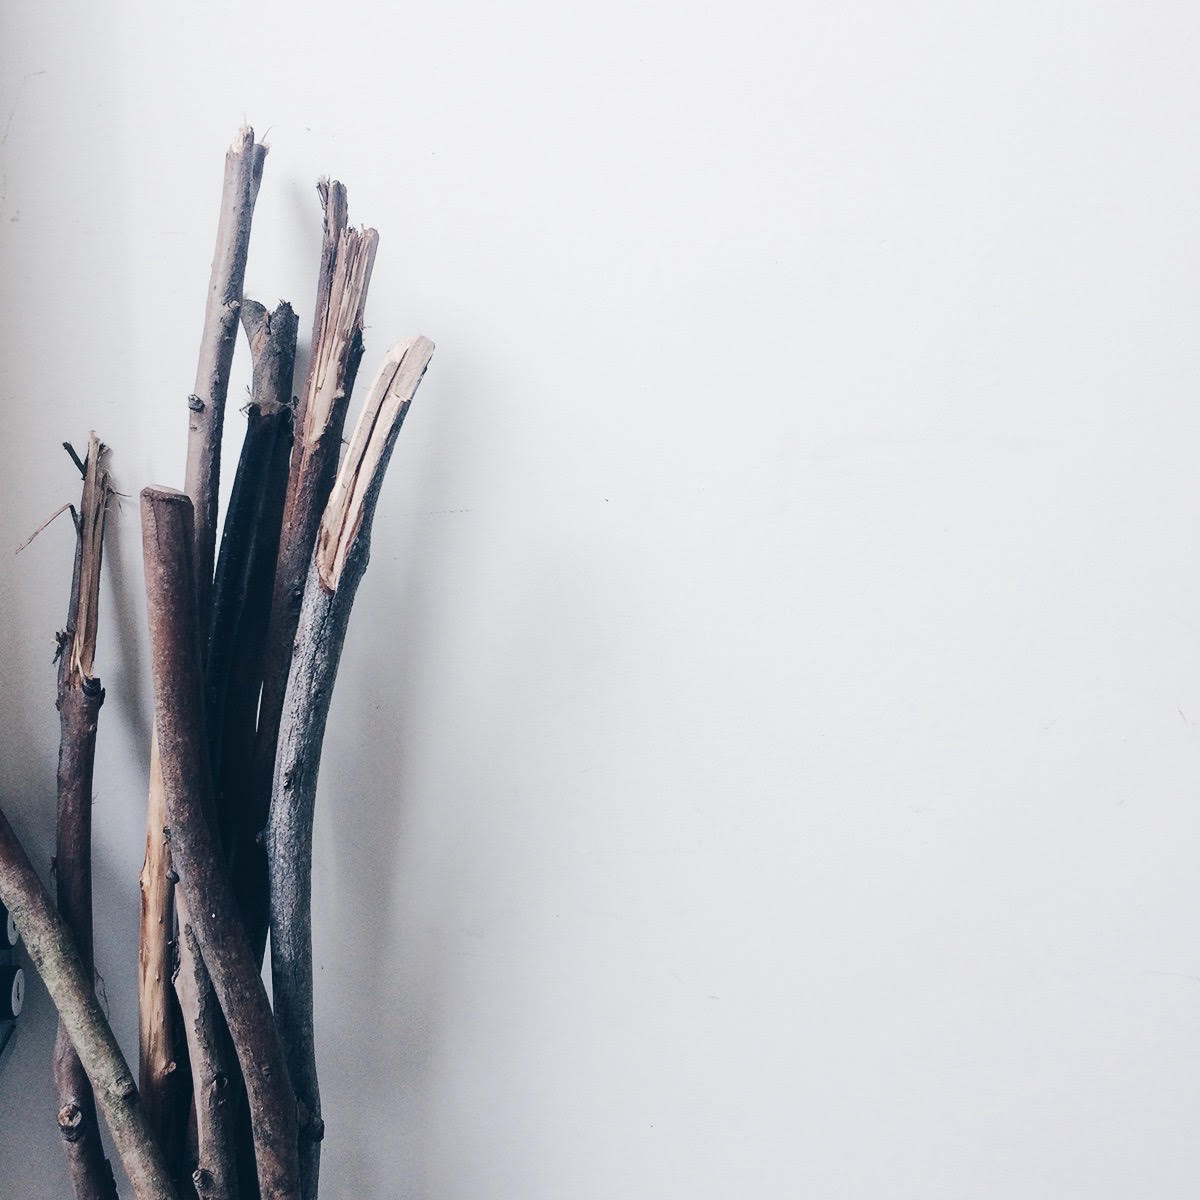 Camino Walking Sticks do you need them?